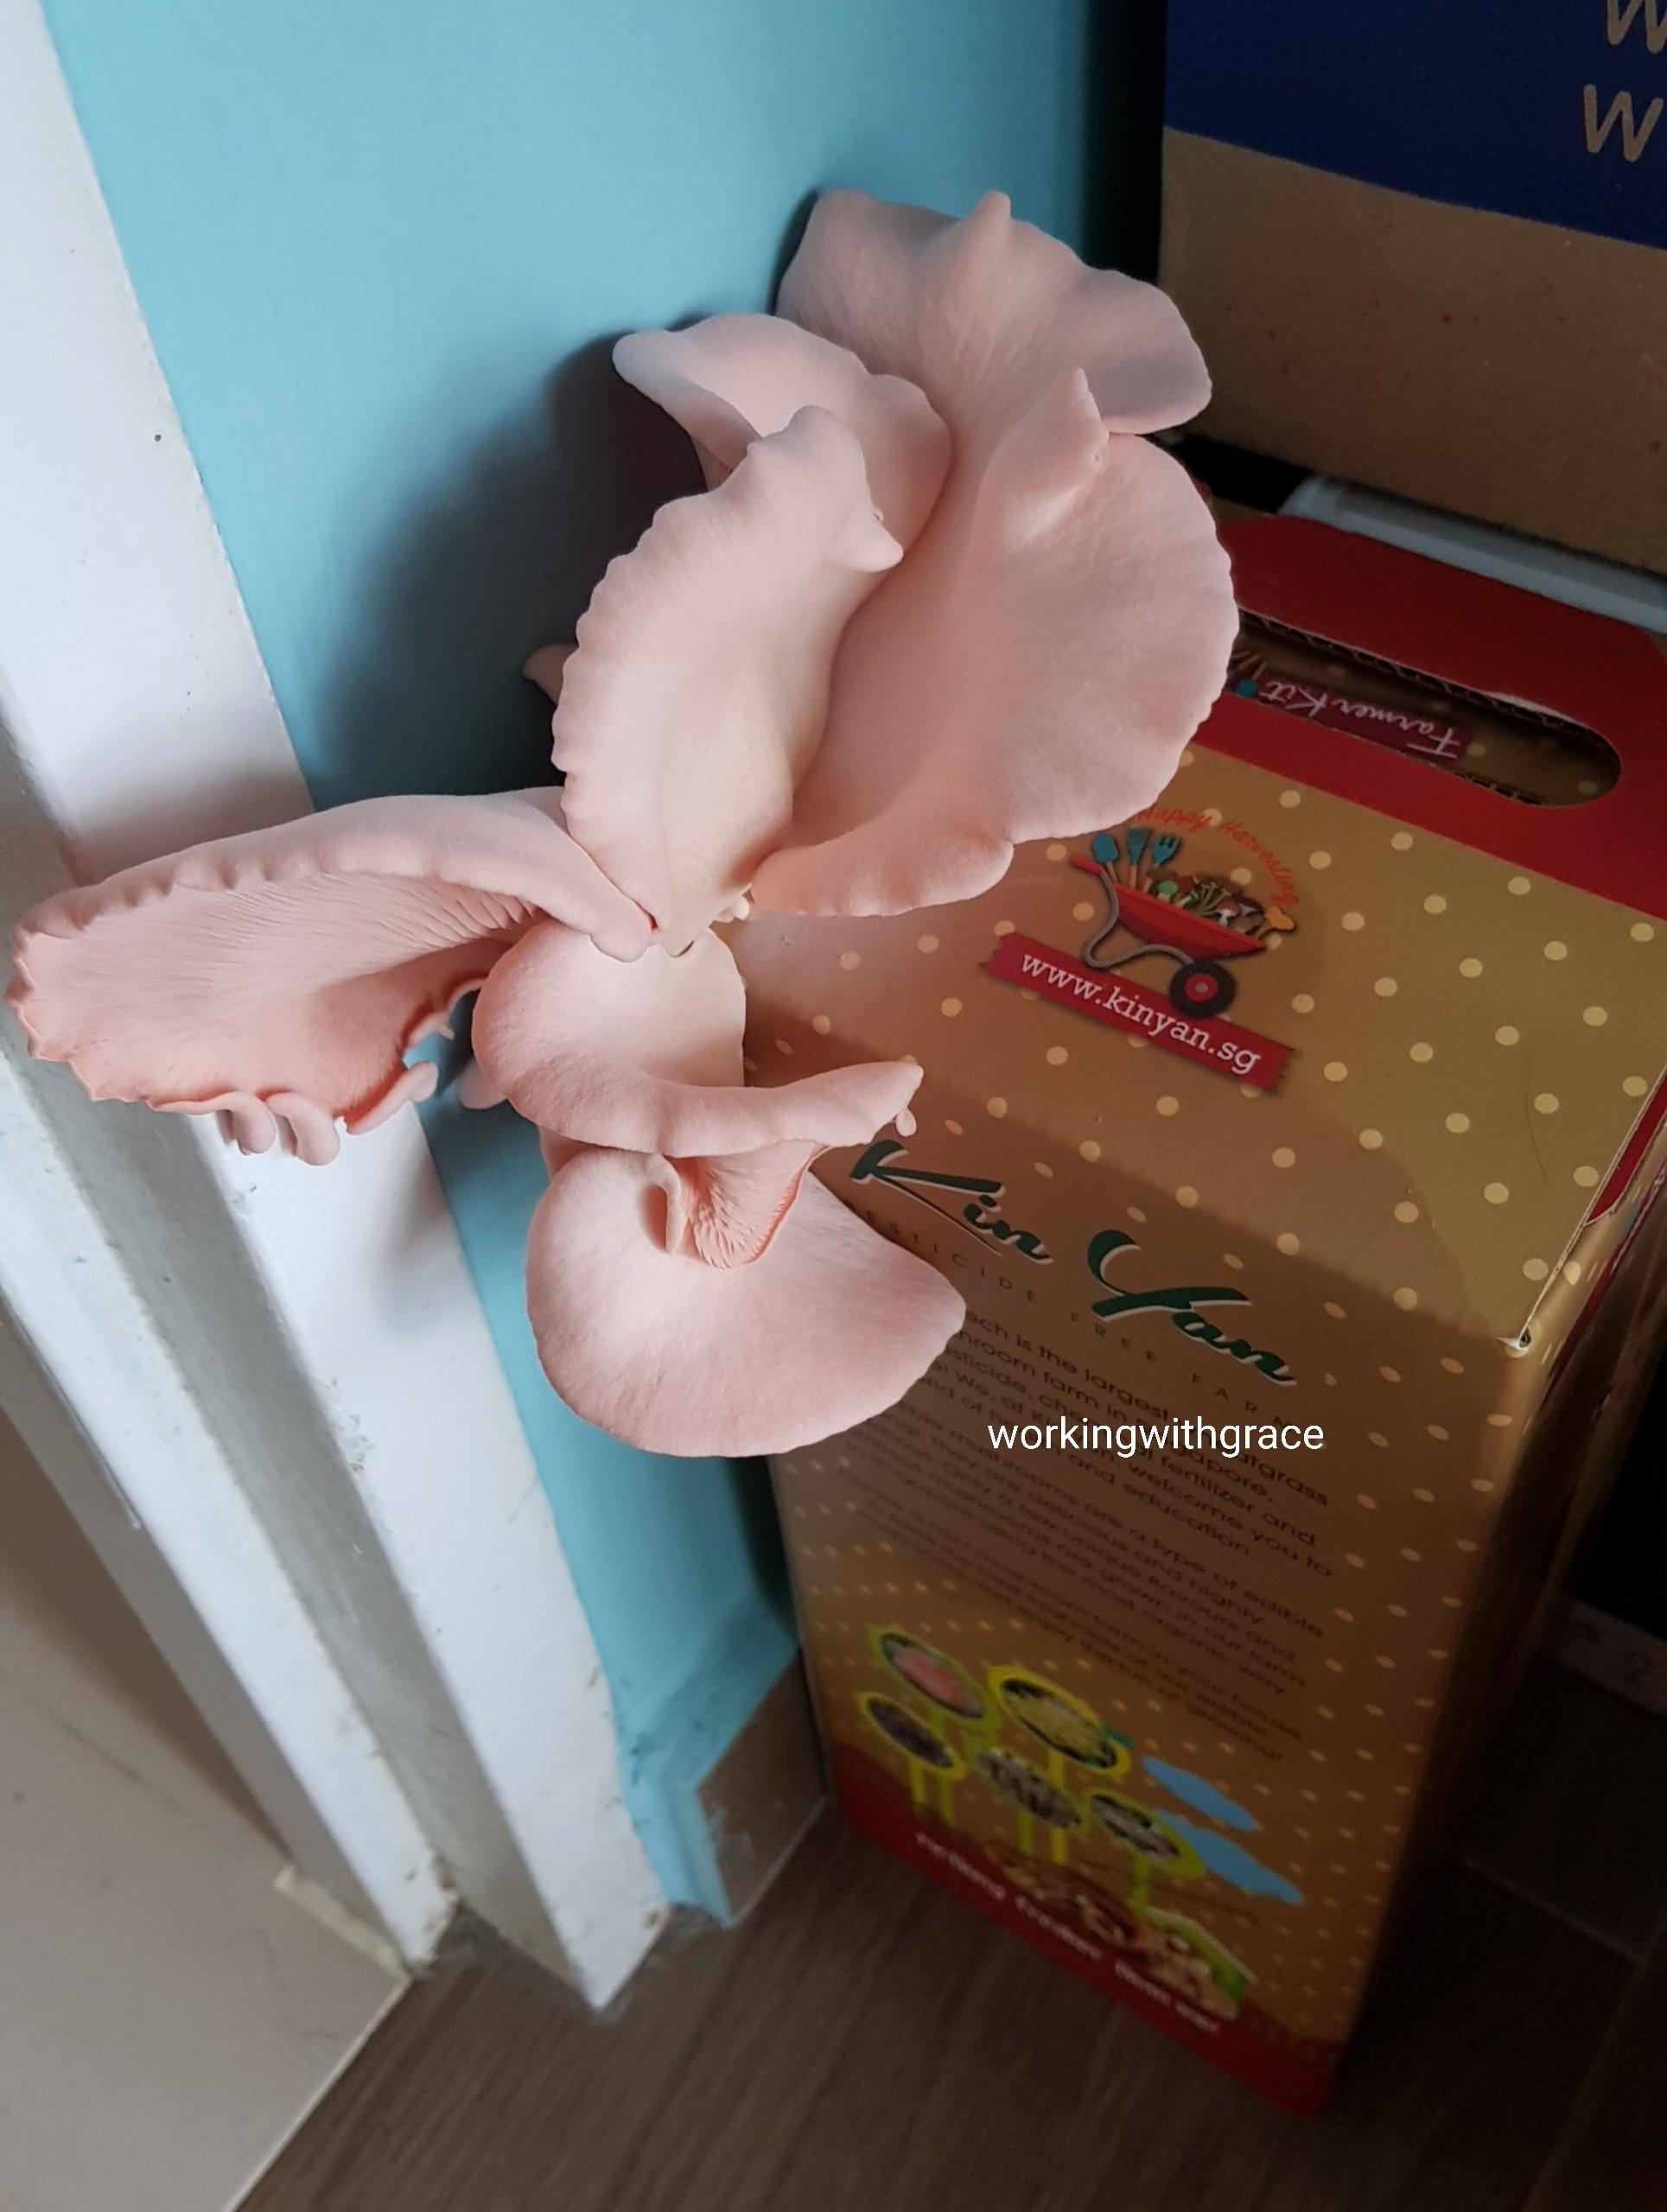 kin yan pink mushroom growing kit